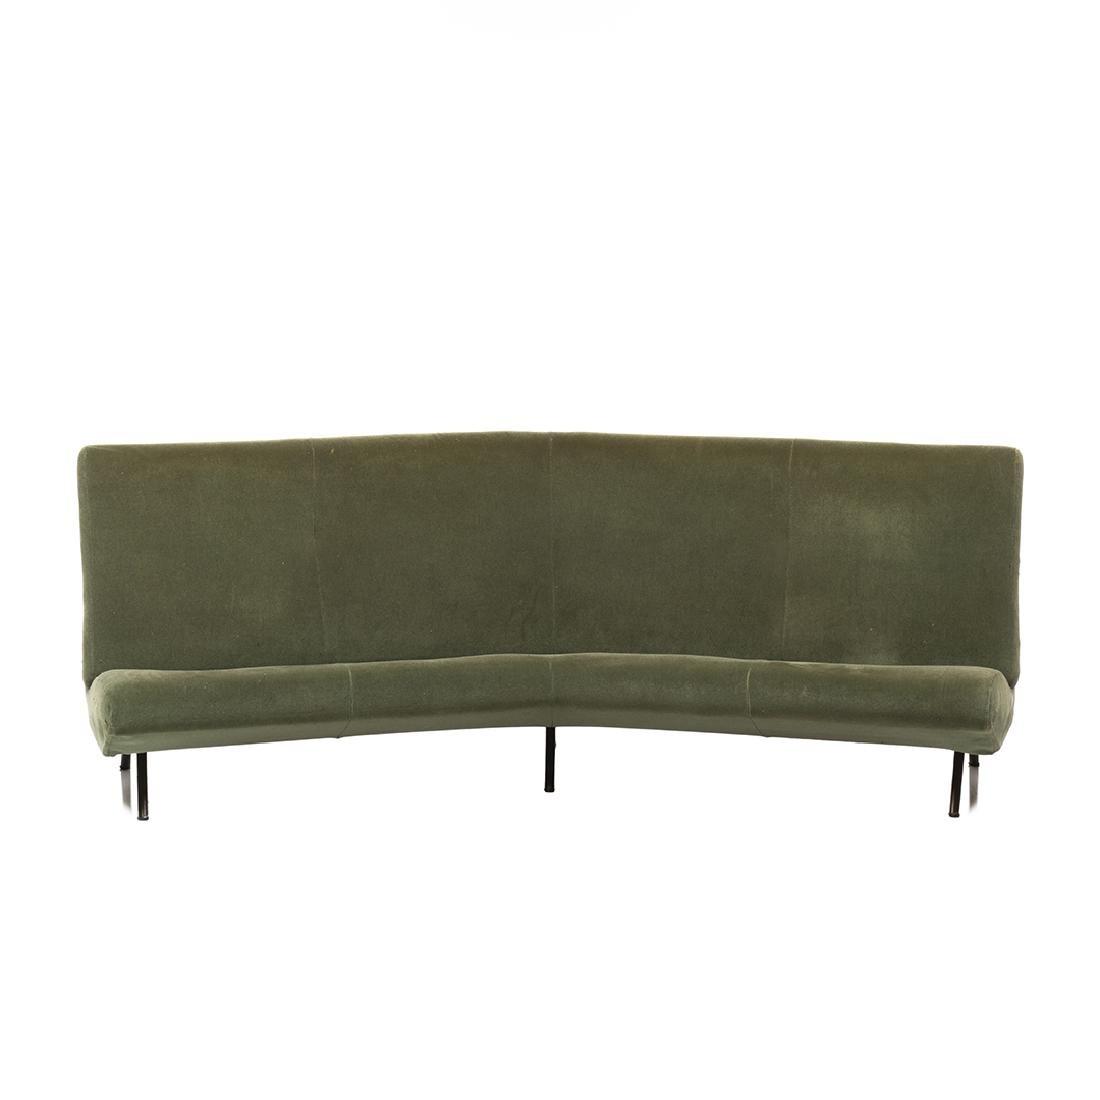 Marco Zanuso Triennale Sofa - 2